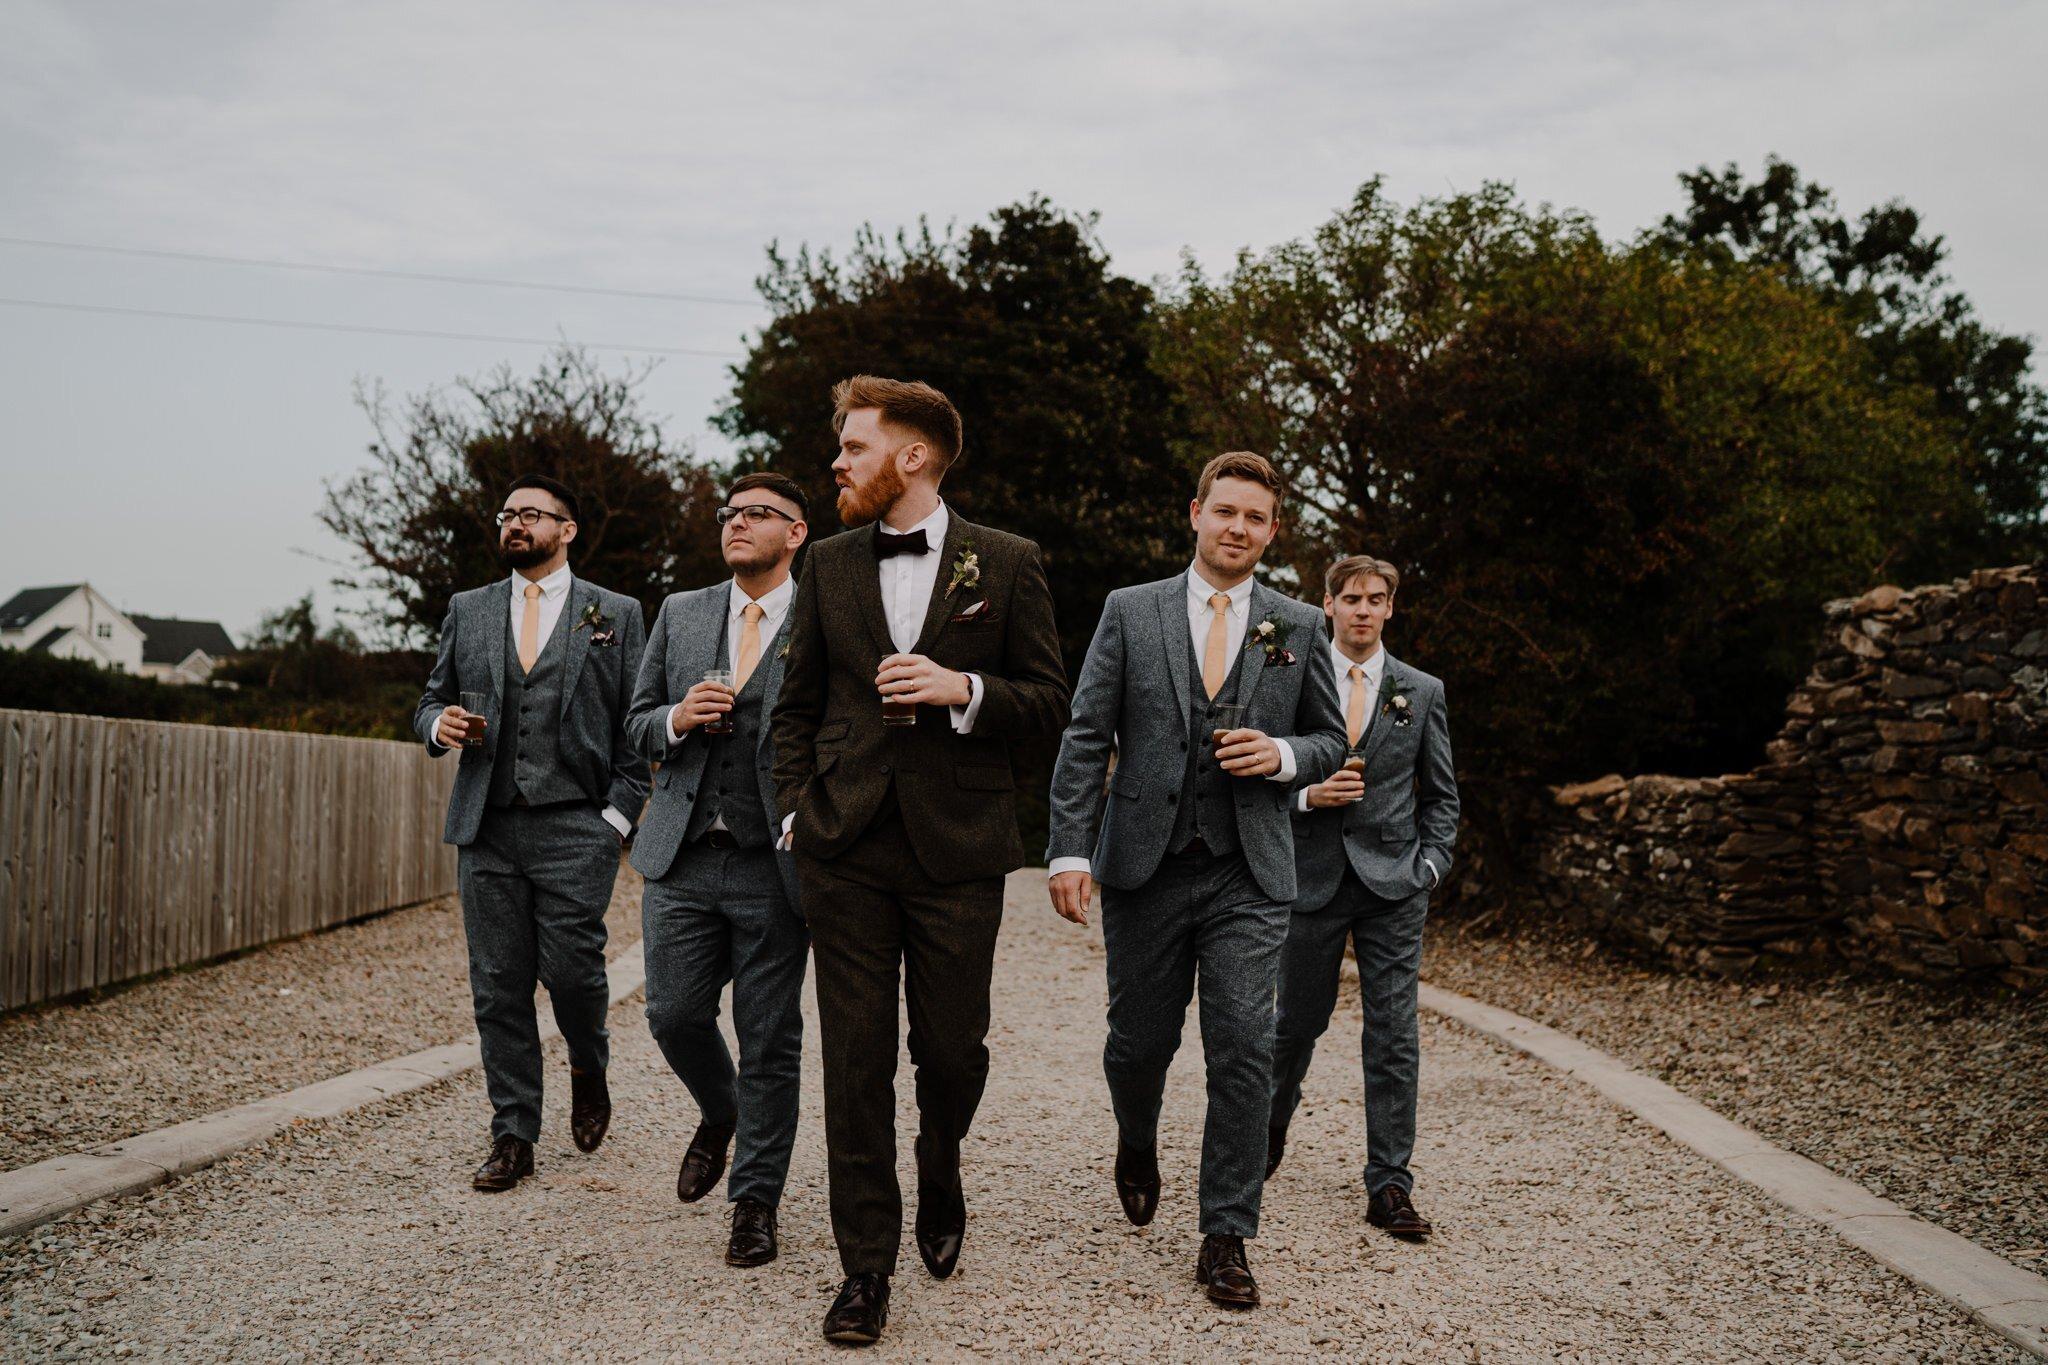 Groomsmen-squad-cool-bogart-tweed-suits